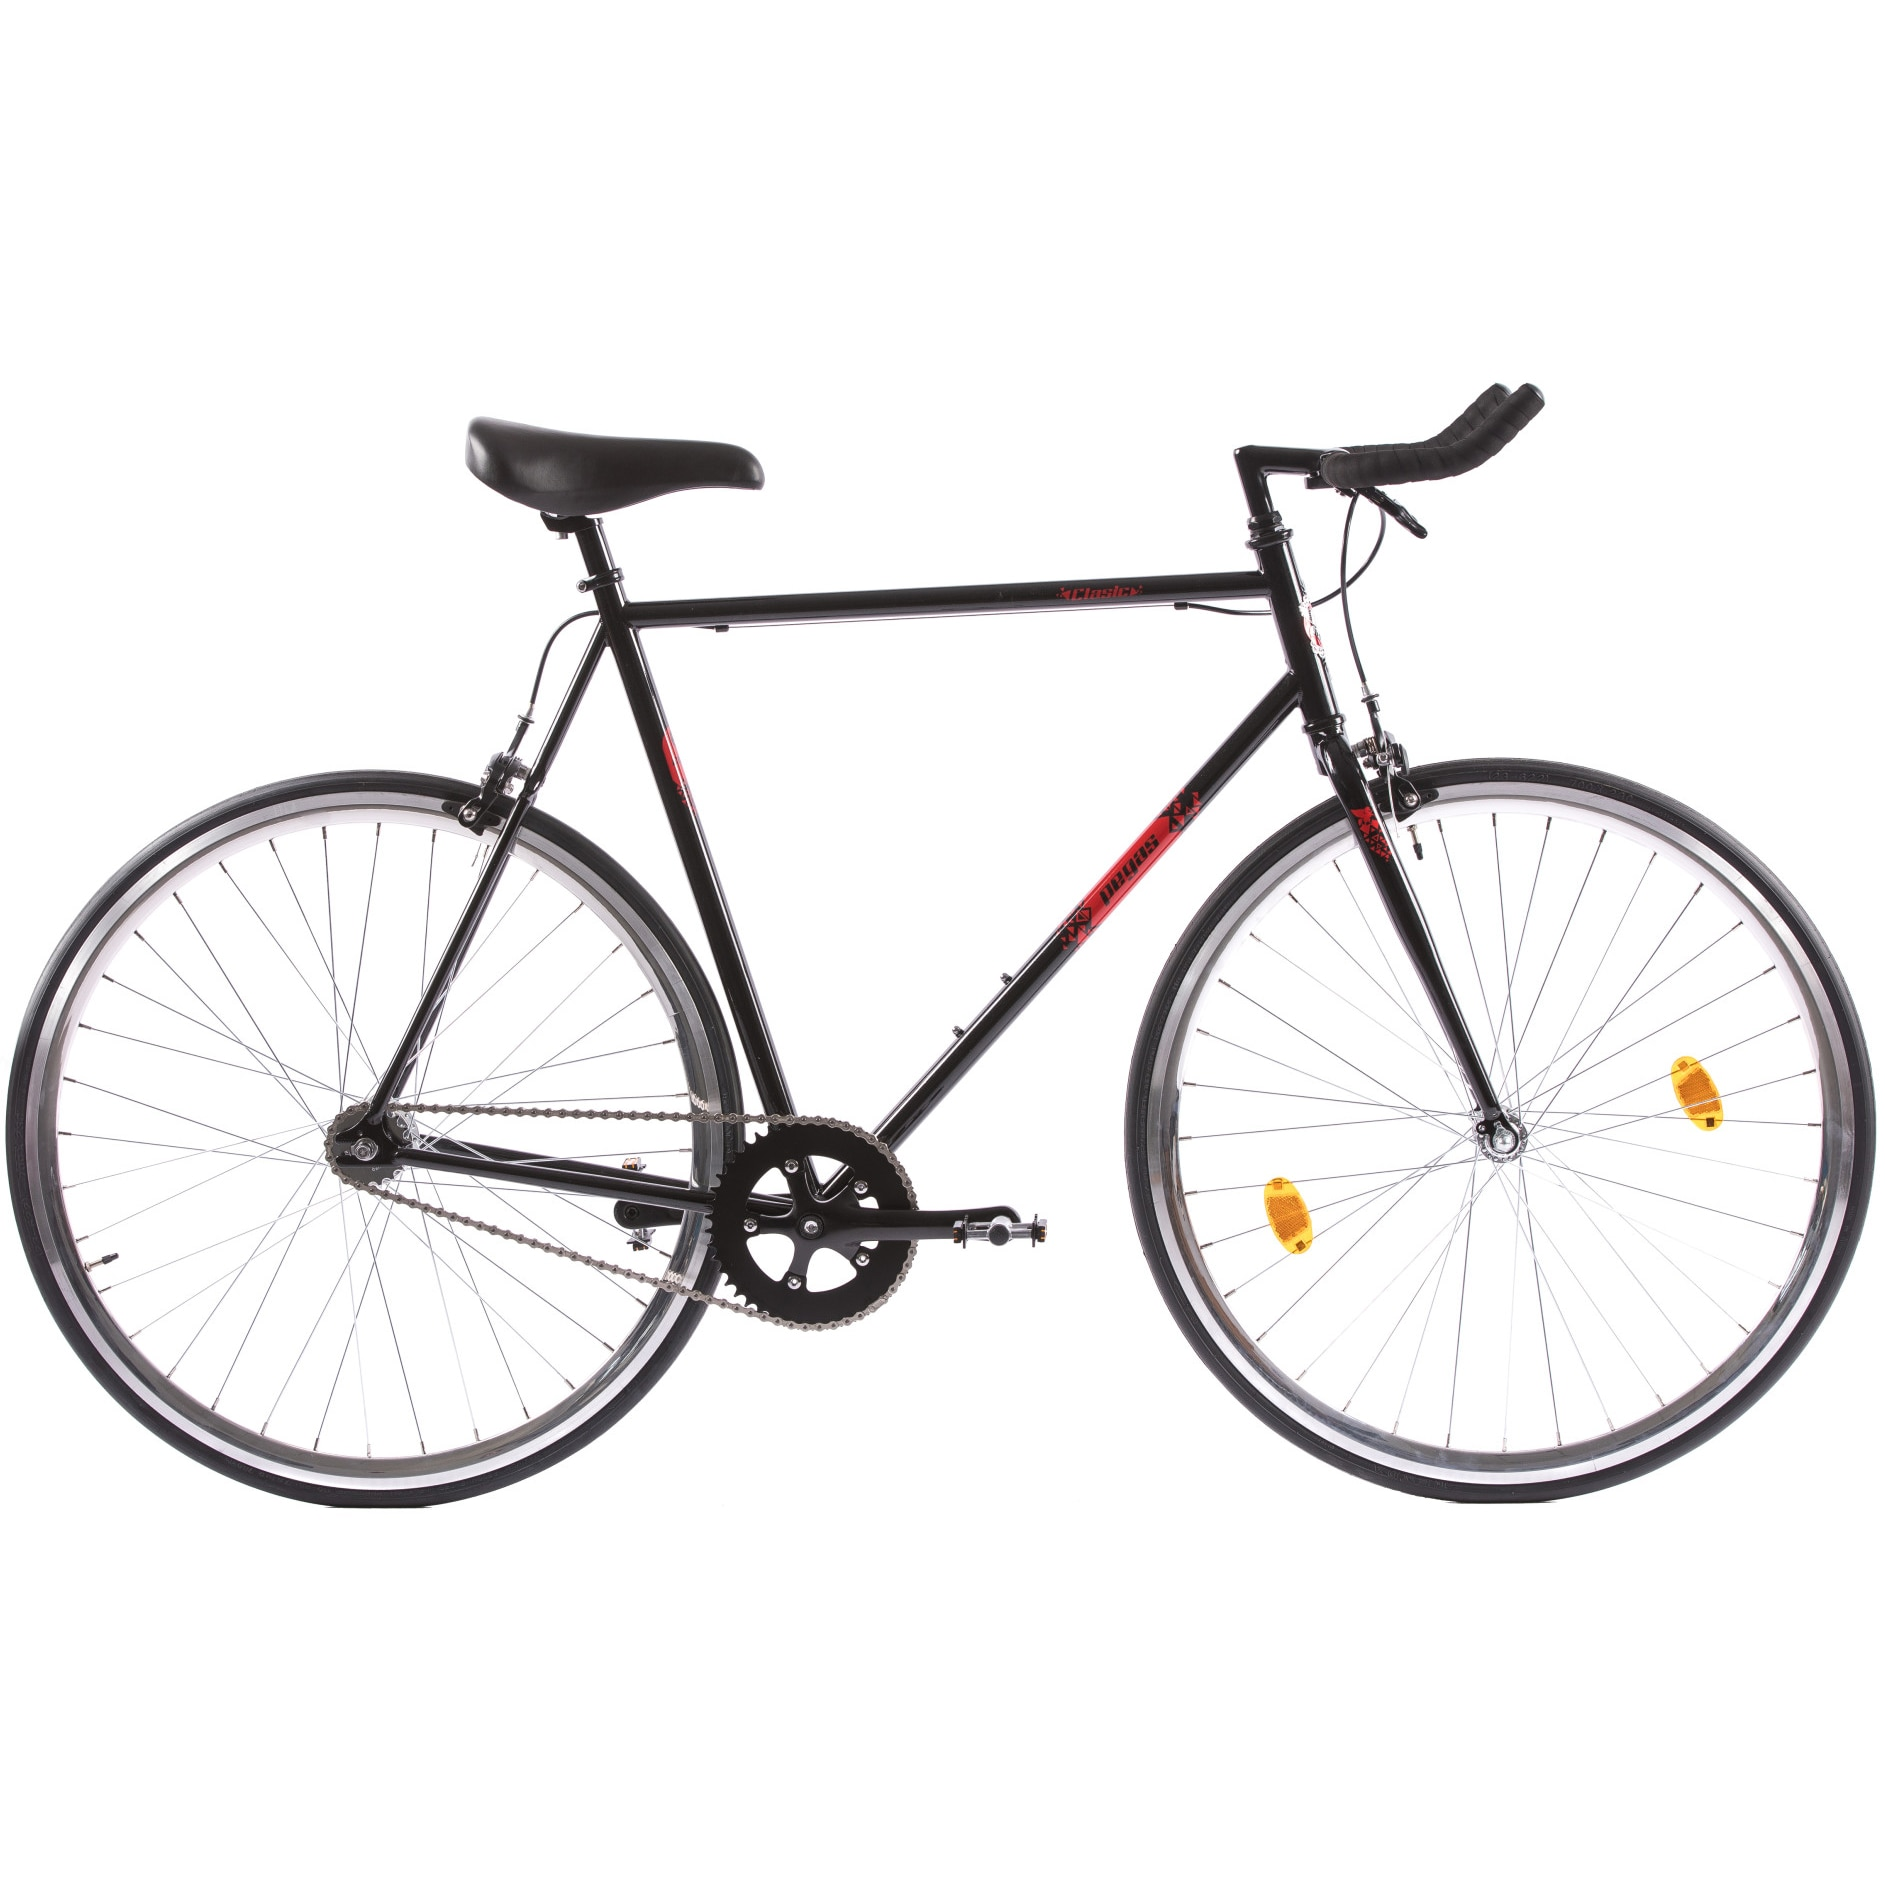 Fotografie Bicicleta Pegas Clasic 2S, Bullhorn Man, 61cm, Negru